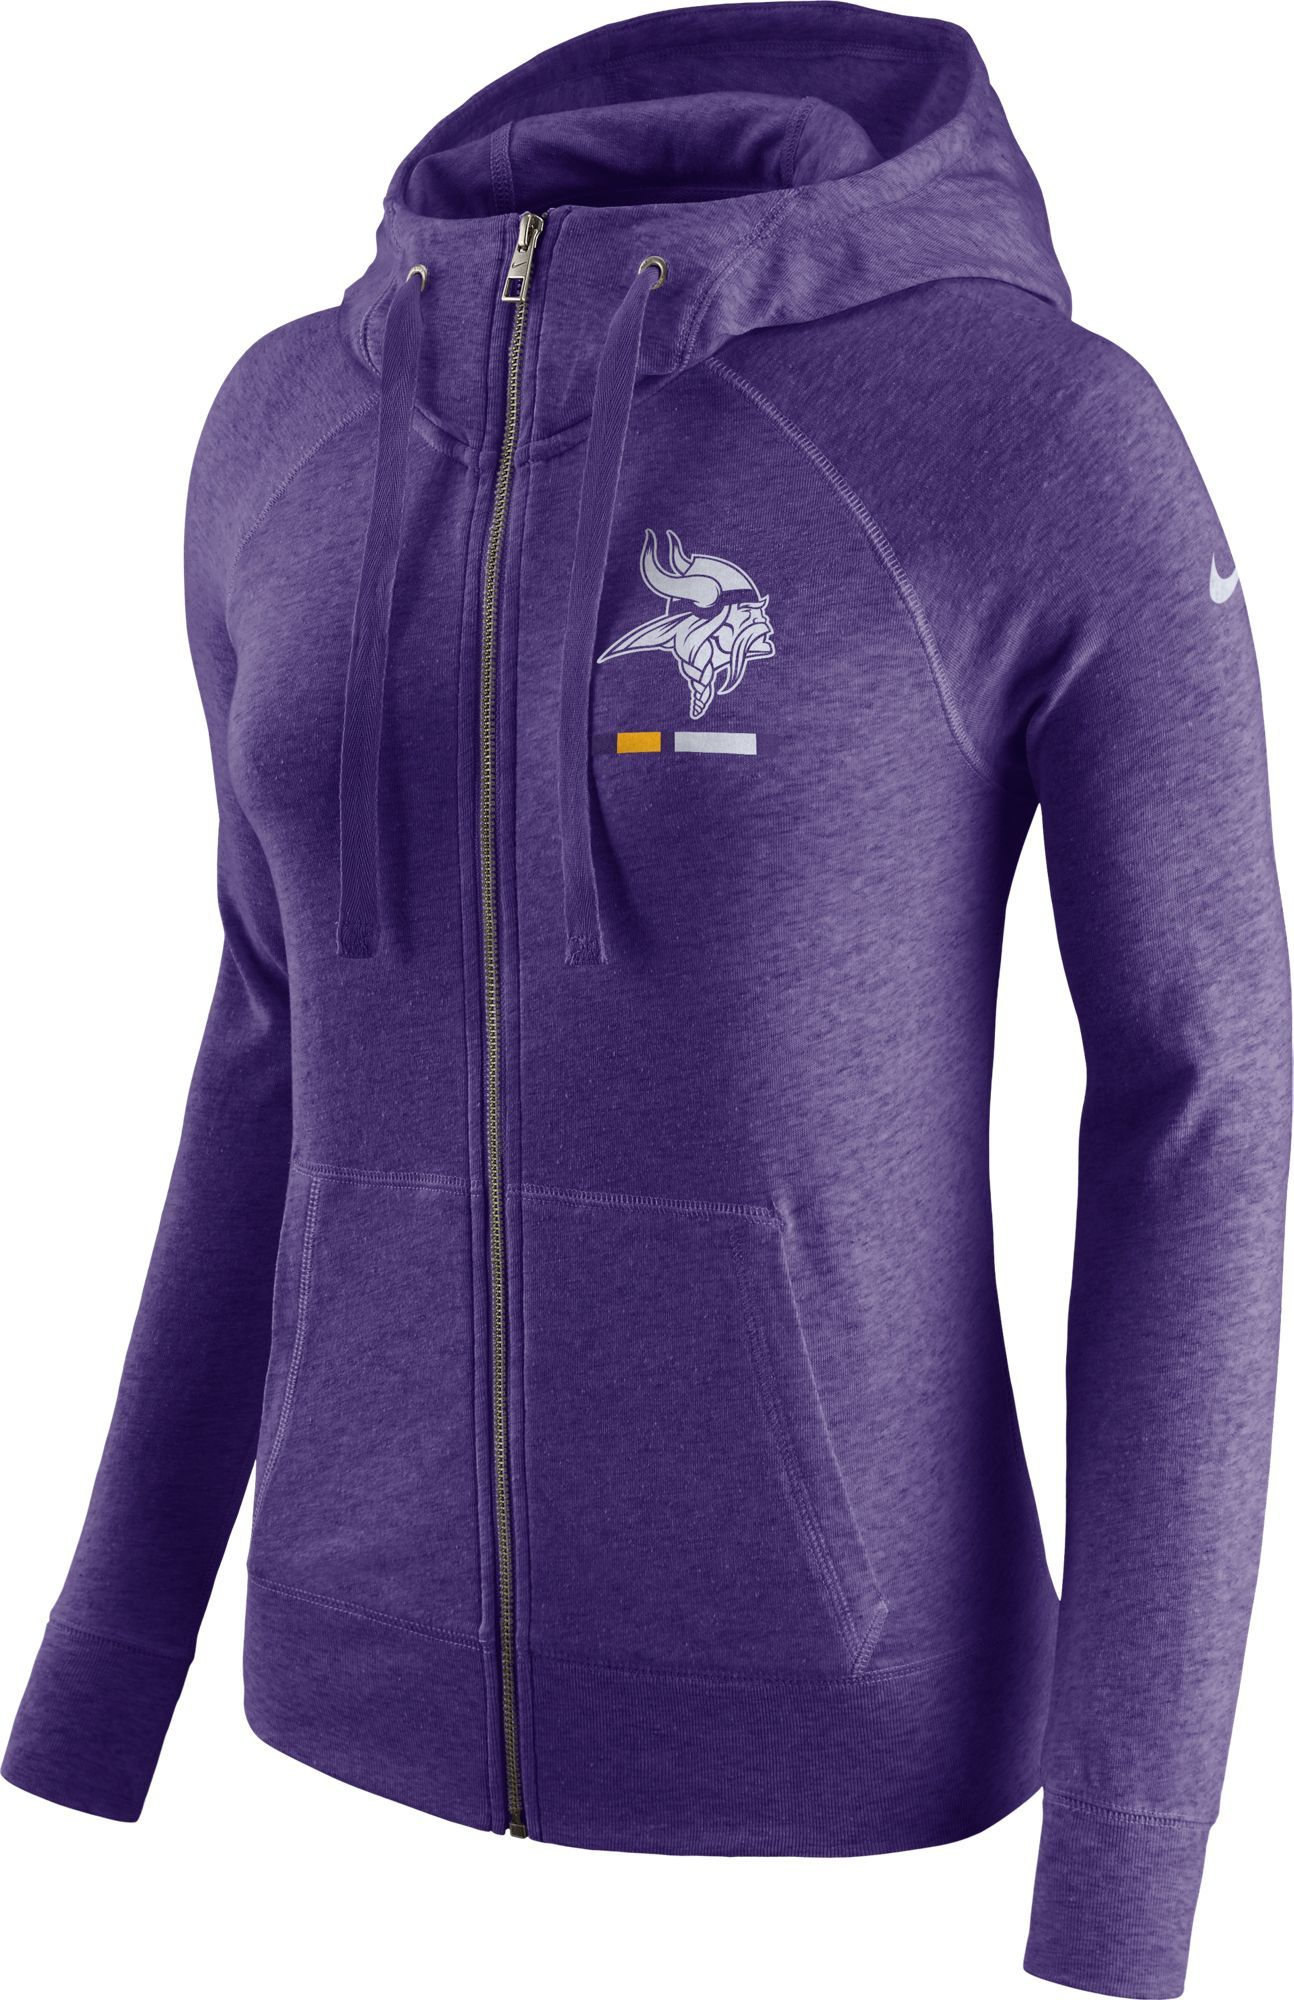 info for 18bd9 815a1 Nike Women's Minnesota Vikings Gym Vintage Full-Zip Purple ...